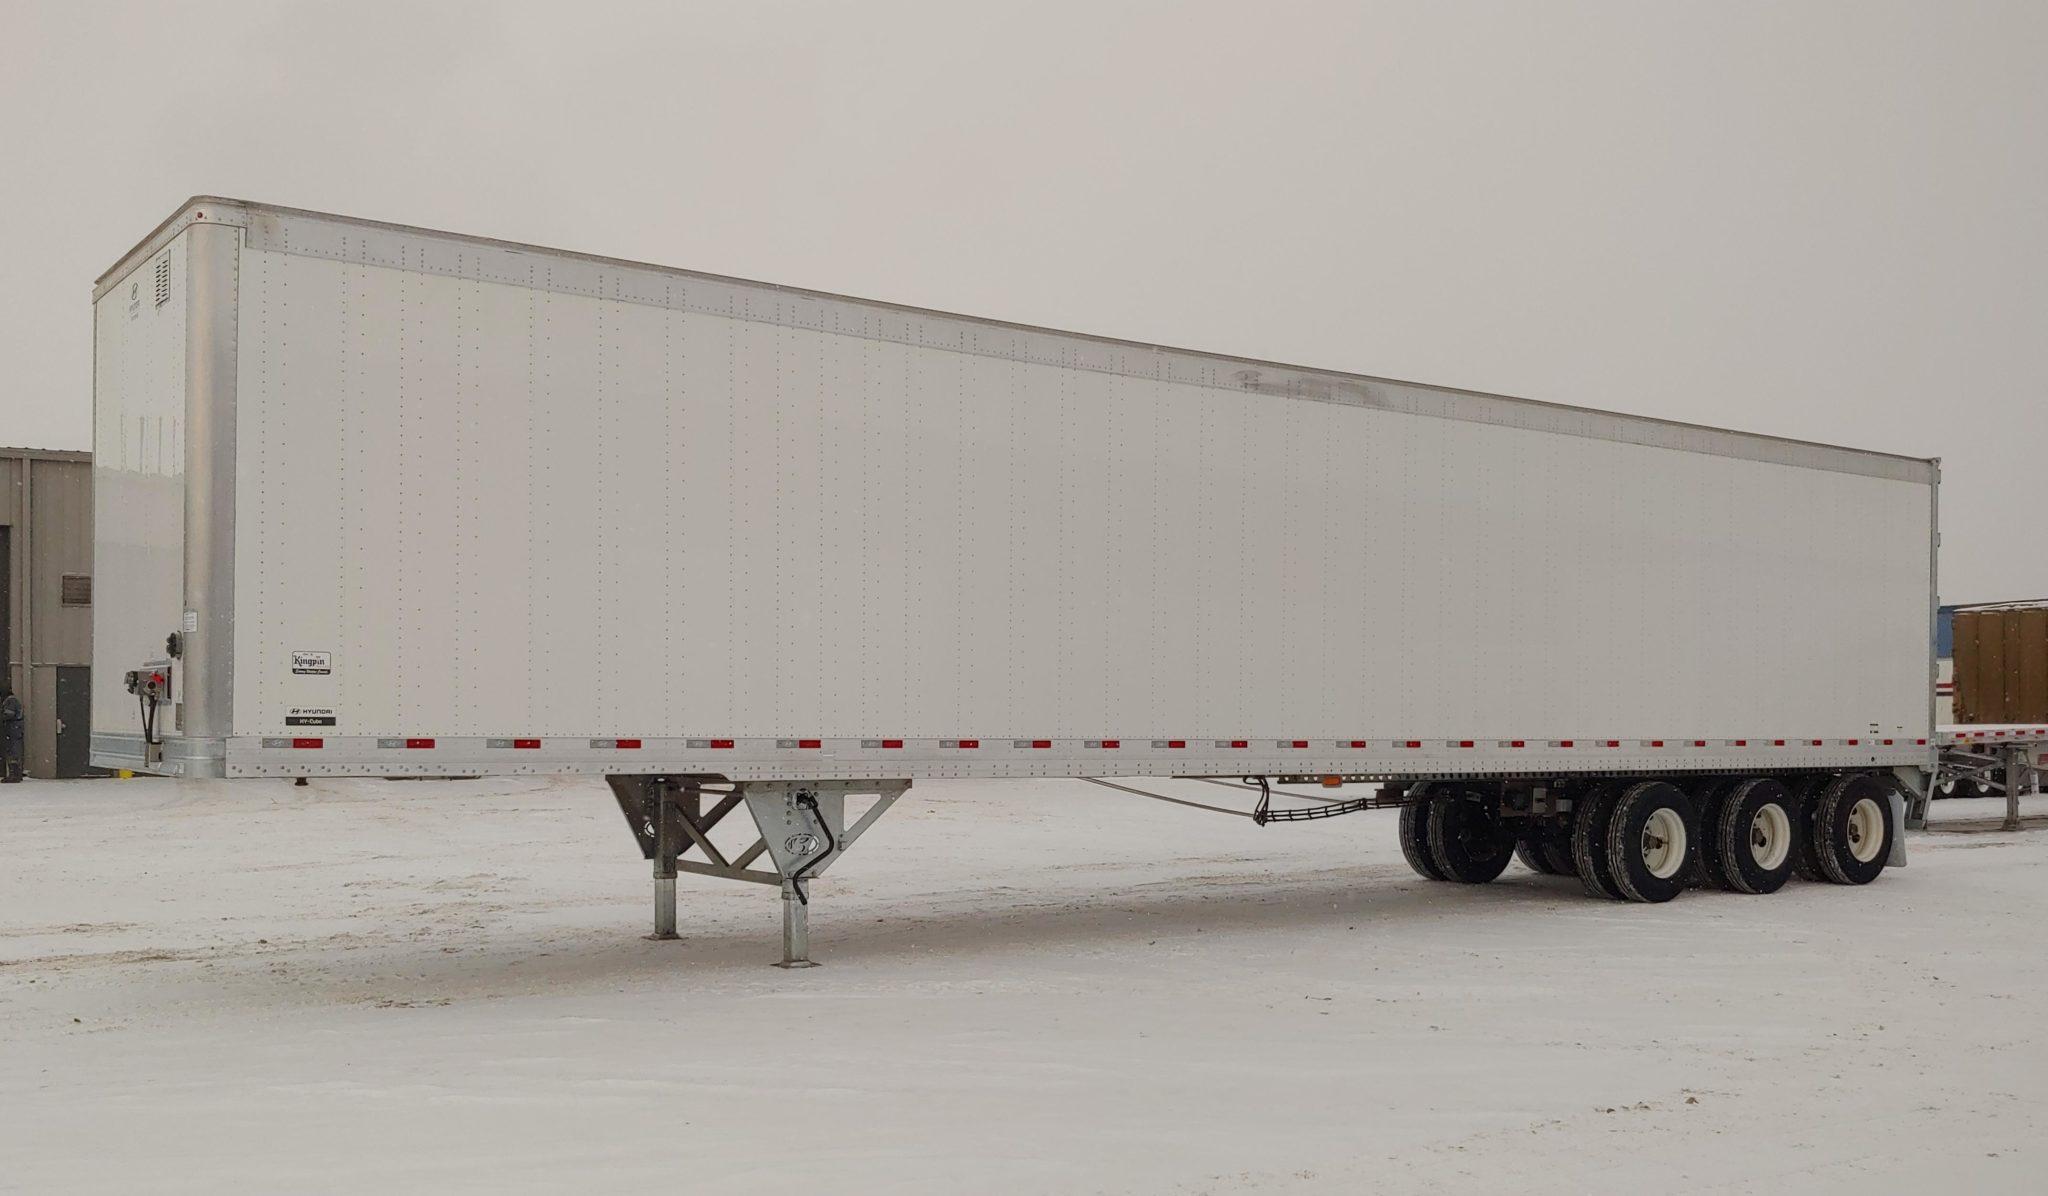 hyundai trailers canada